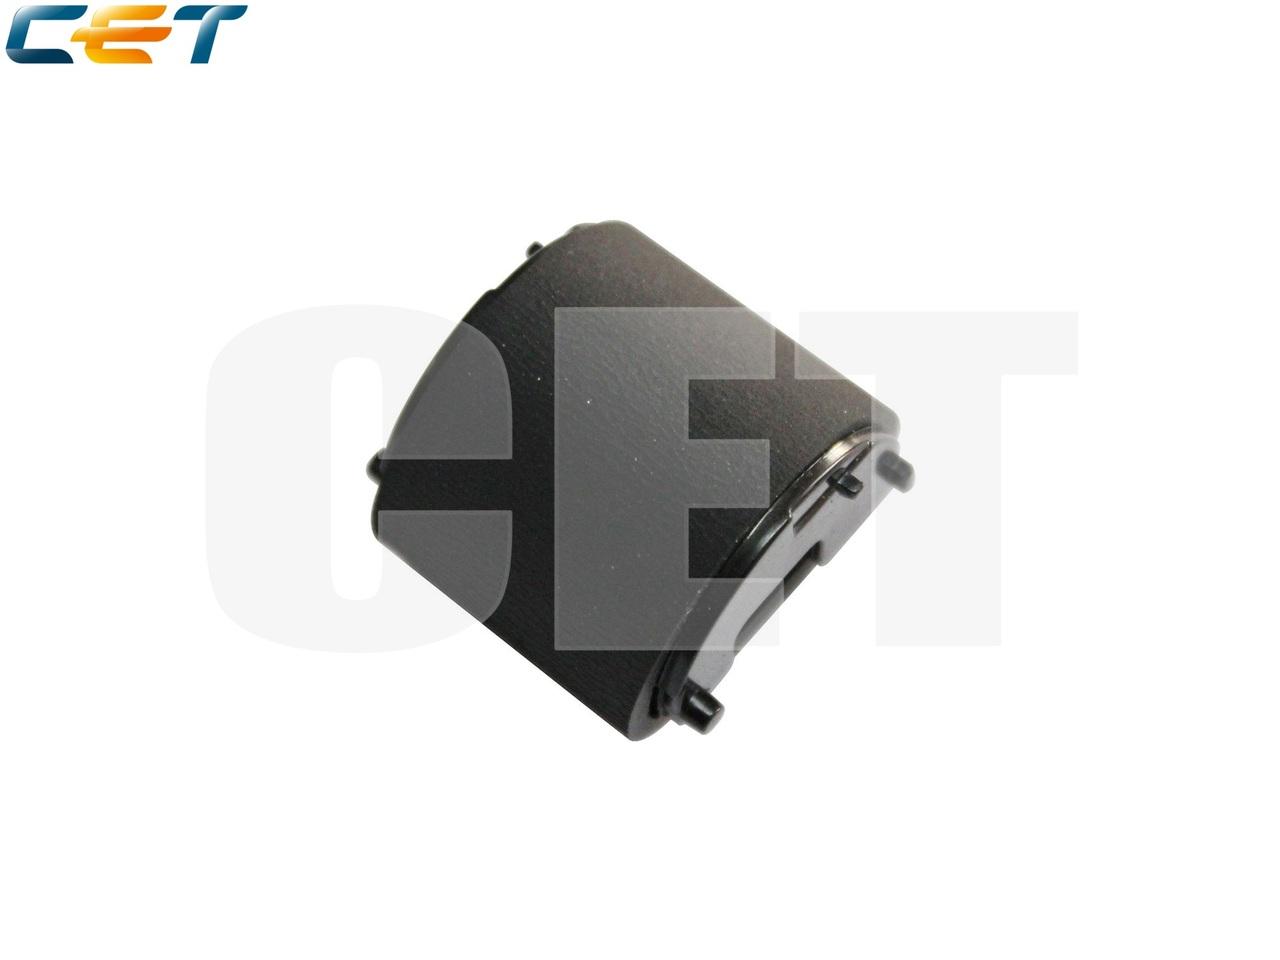 Ролик подхвата 1-го лотка RL1-0568-000, RL1-2412-000 для HPLaserJet Enterprise P3015/P3005, M521/M525 (CET), CET5857